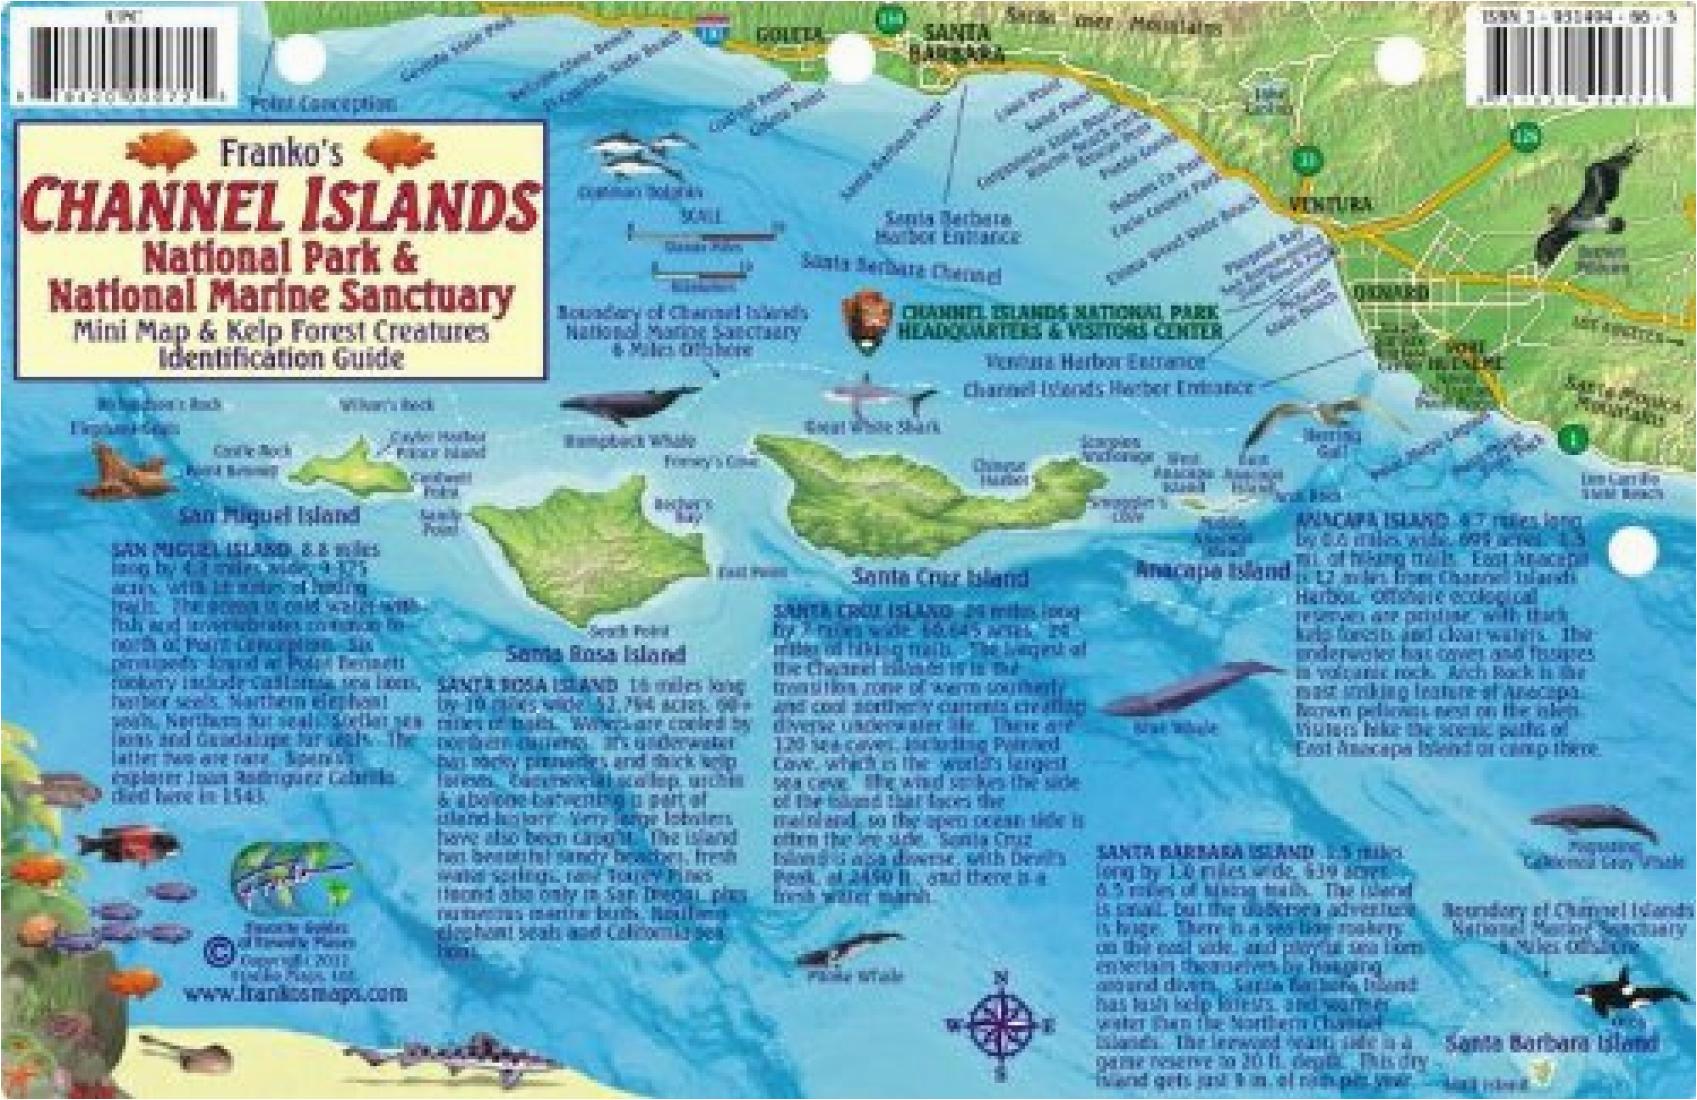 california fish card channel islands 2011 by frankos maps ltd